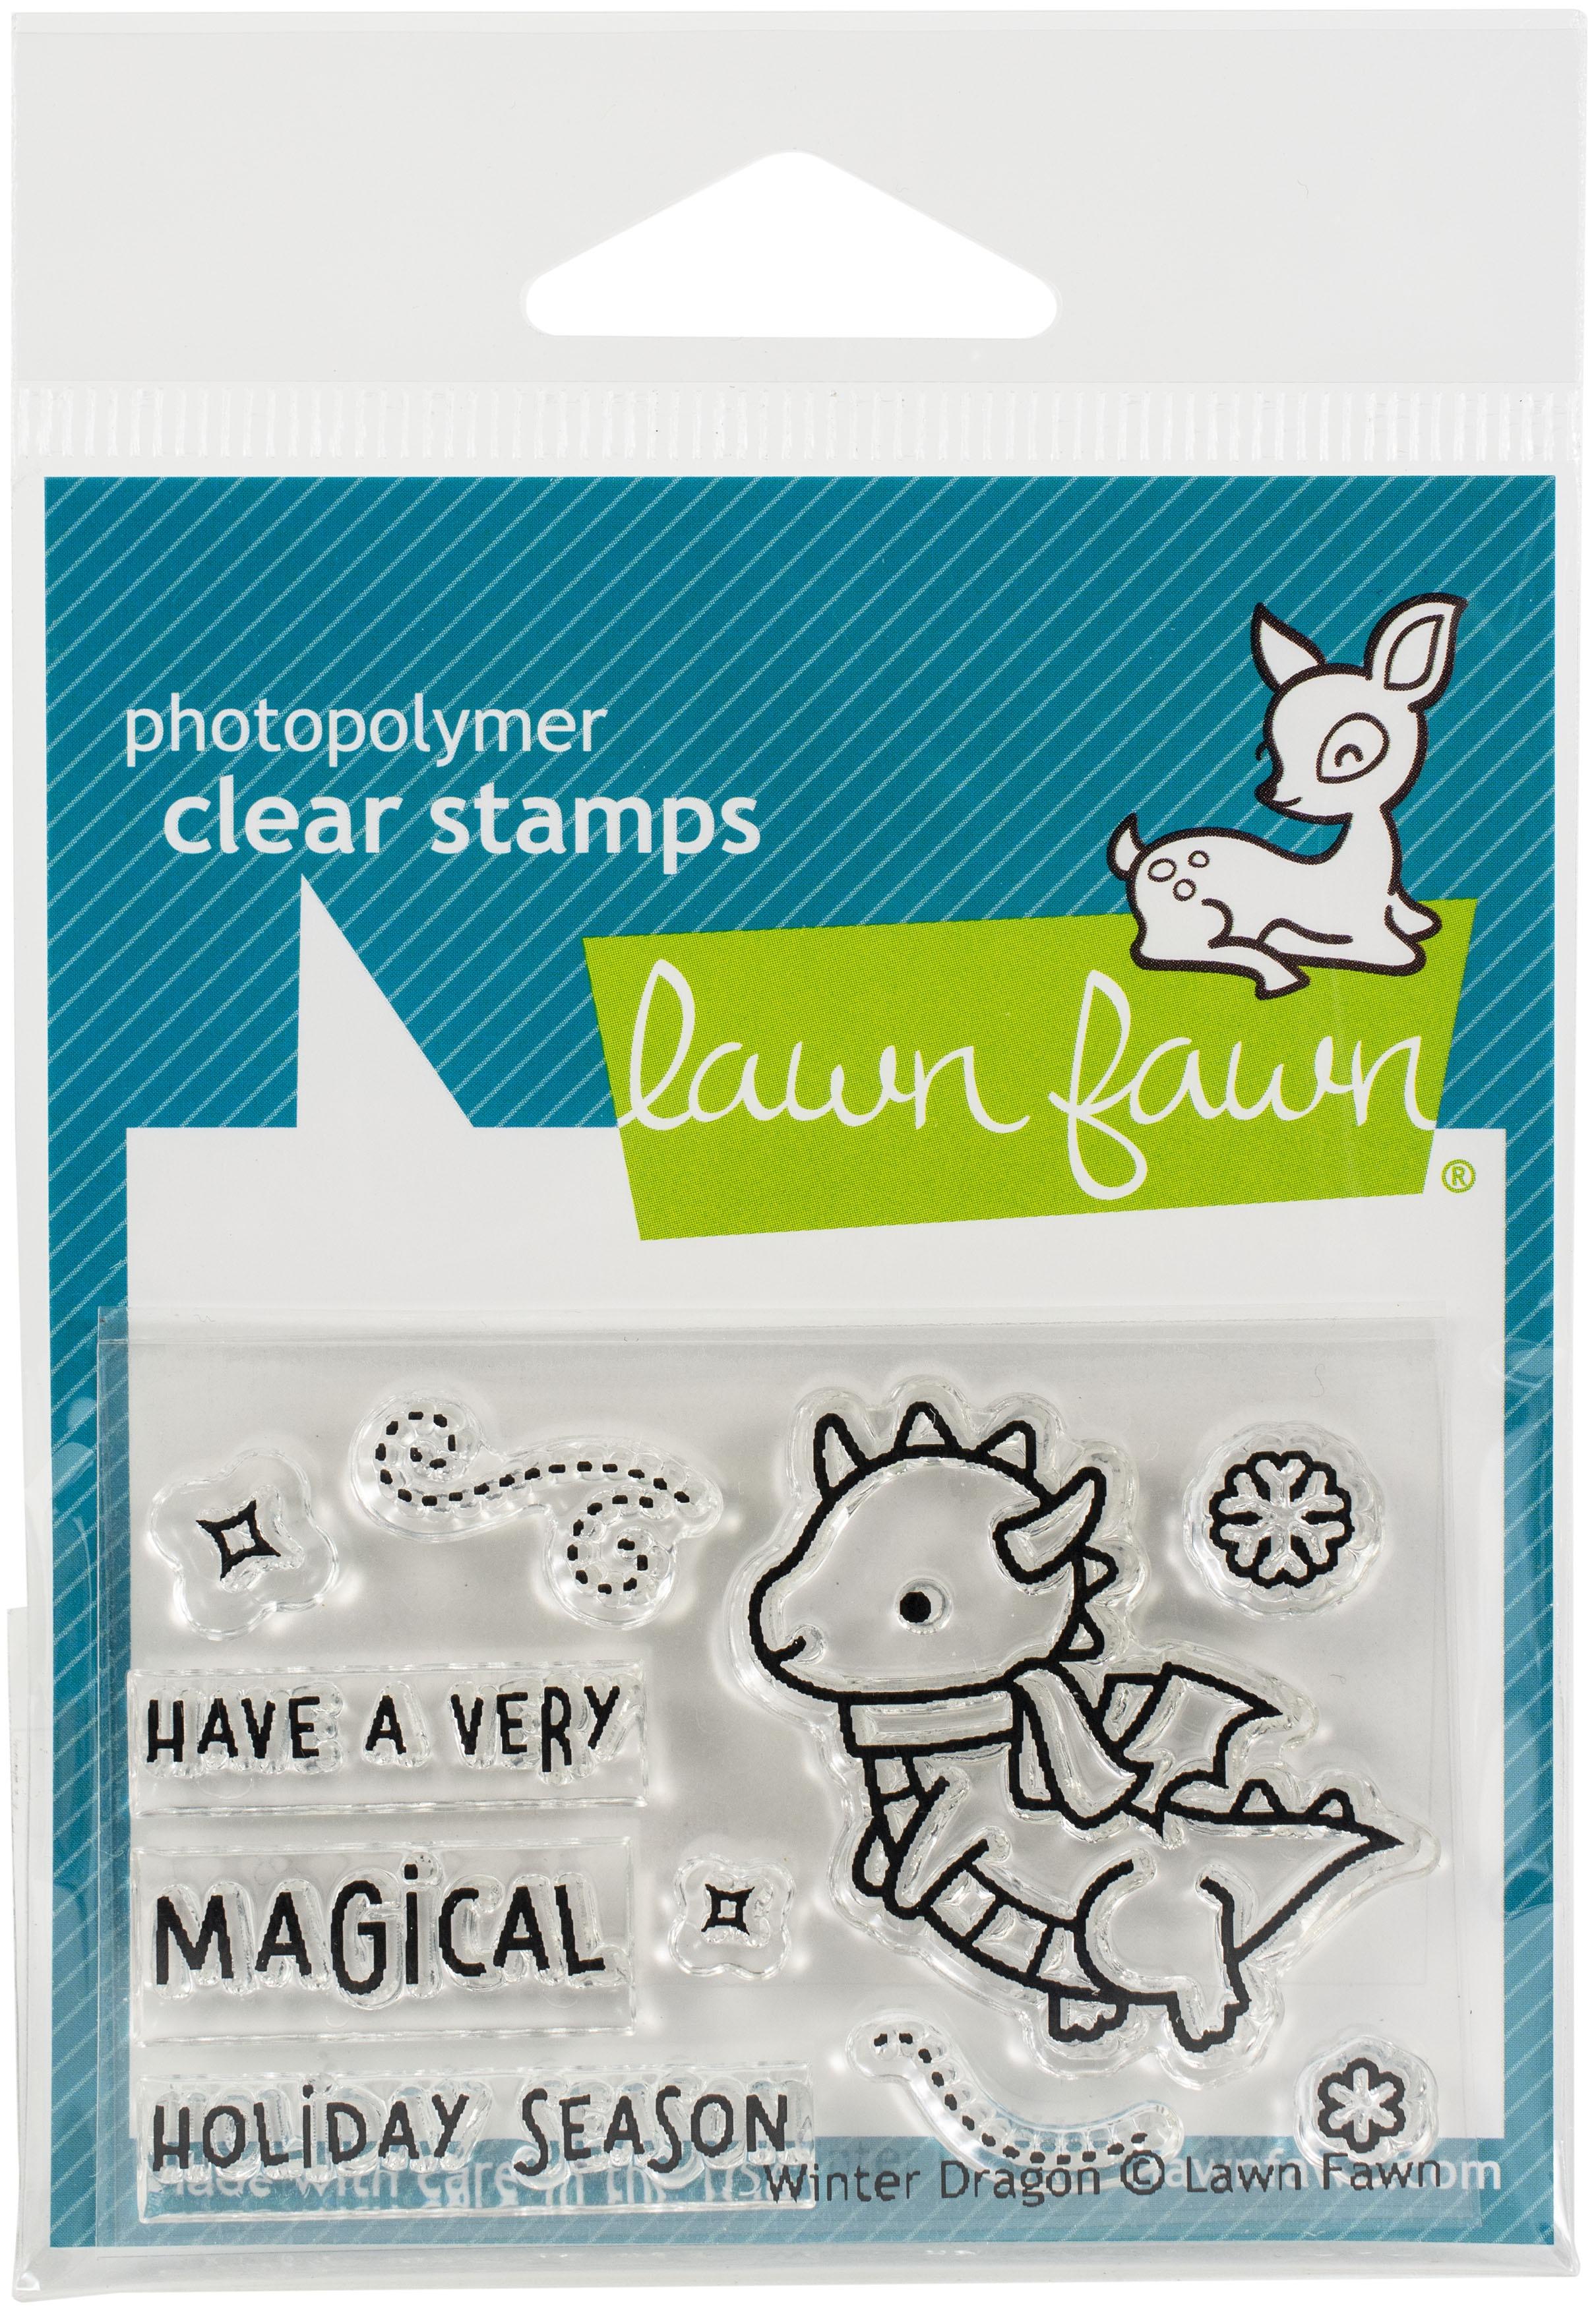 Lawn Fawn Winter Dragon Stamp